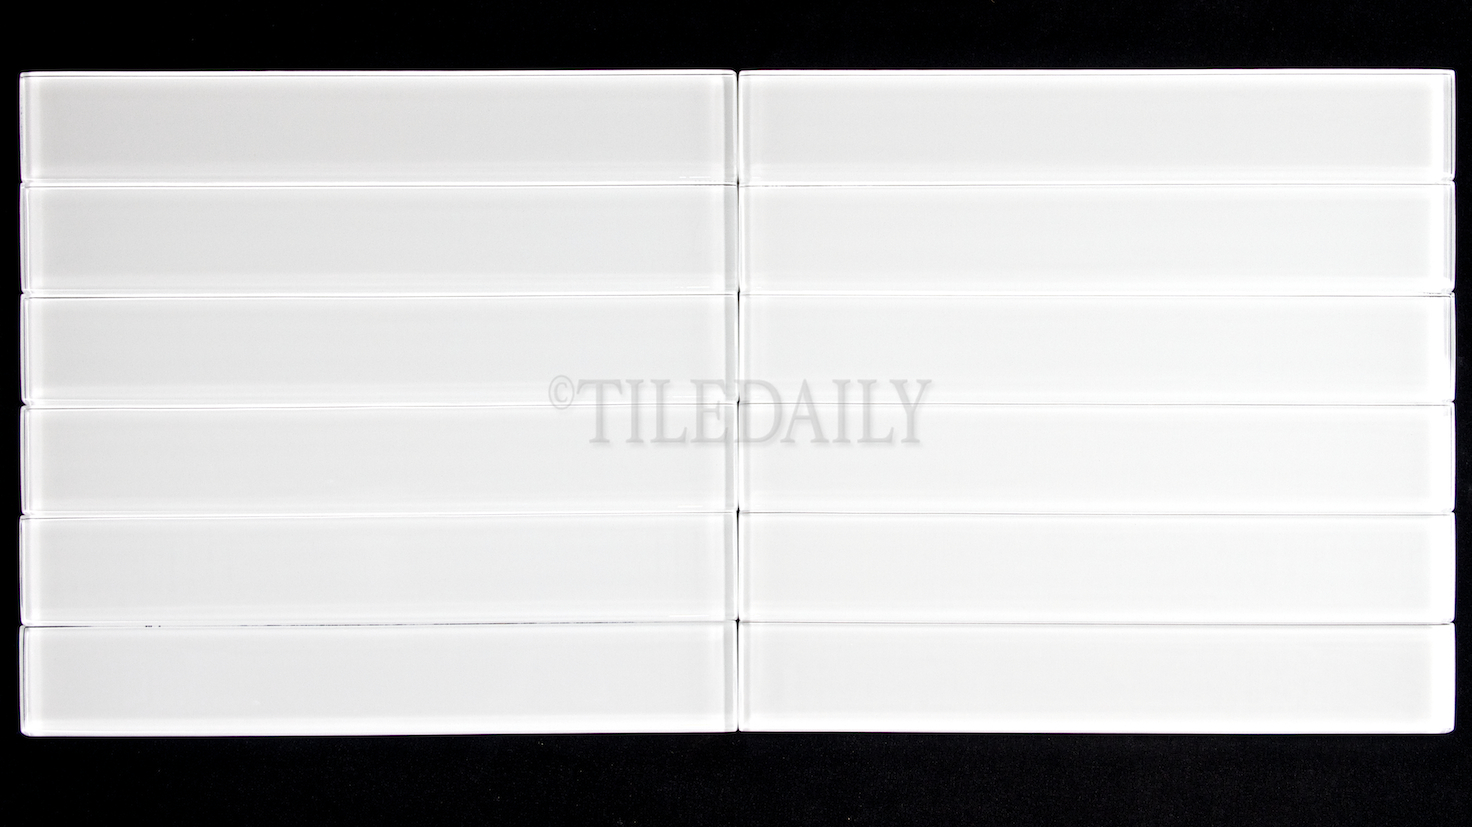 Pretty 1 X 1 Acoustic Ceiling Tiles Small 12X12 Ceramic Tile Clean 1950S Floor Tiles 2X2 Ceiling Tiles Lowes Old 2X4 Drop Ceiling Tiles Home Depot Bright2X4 Glass Tile Backsplash Glossy \u2013 Tiledaily